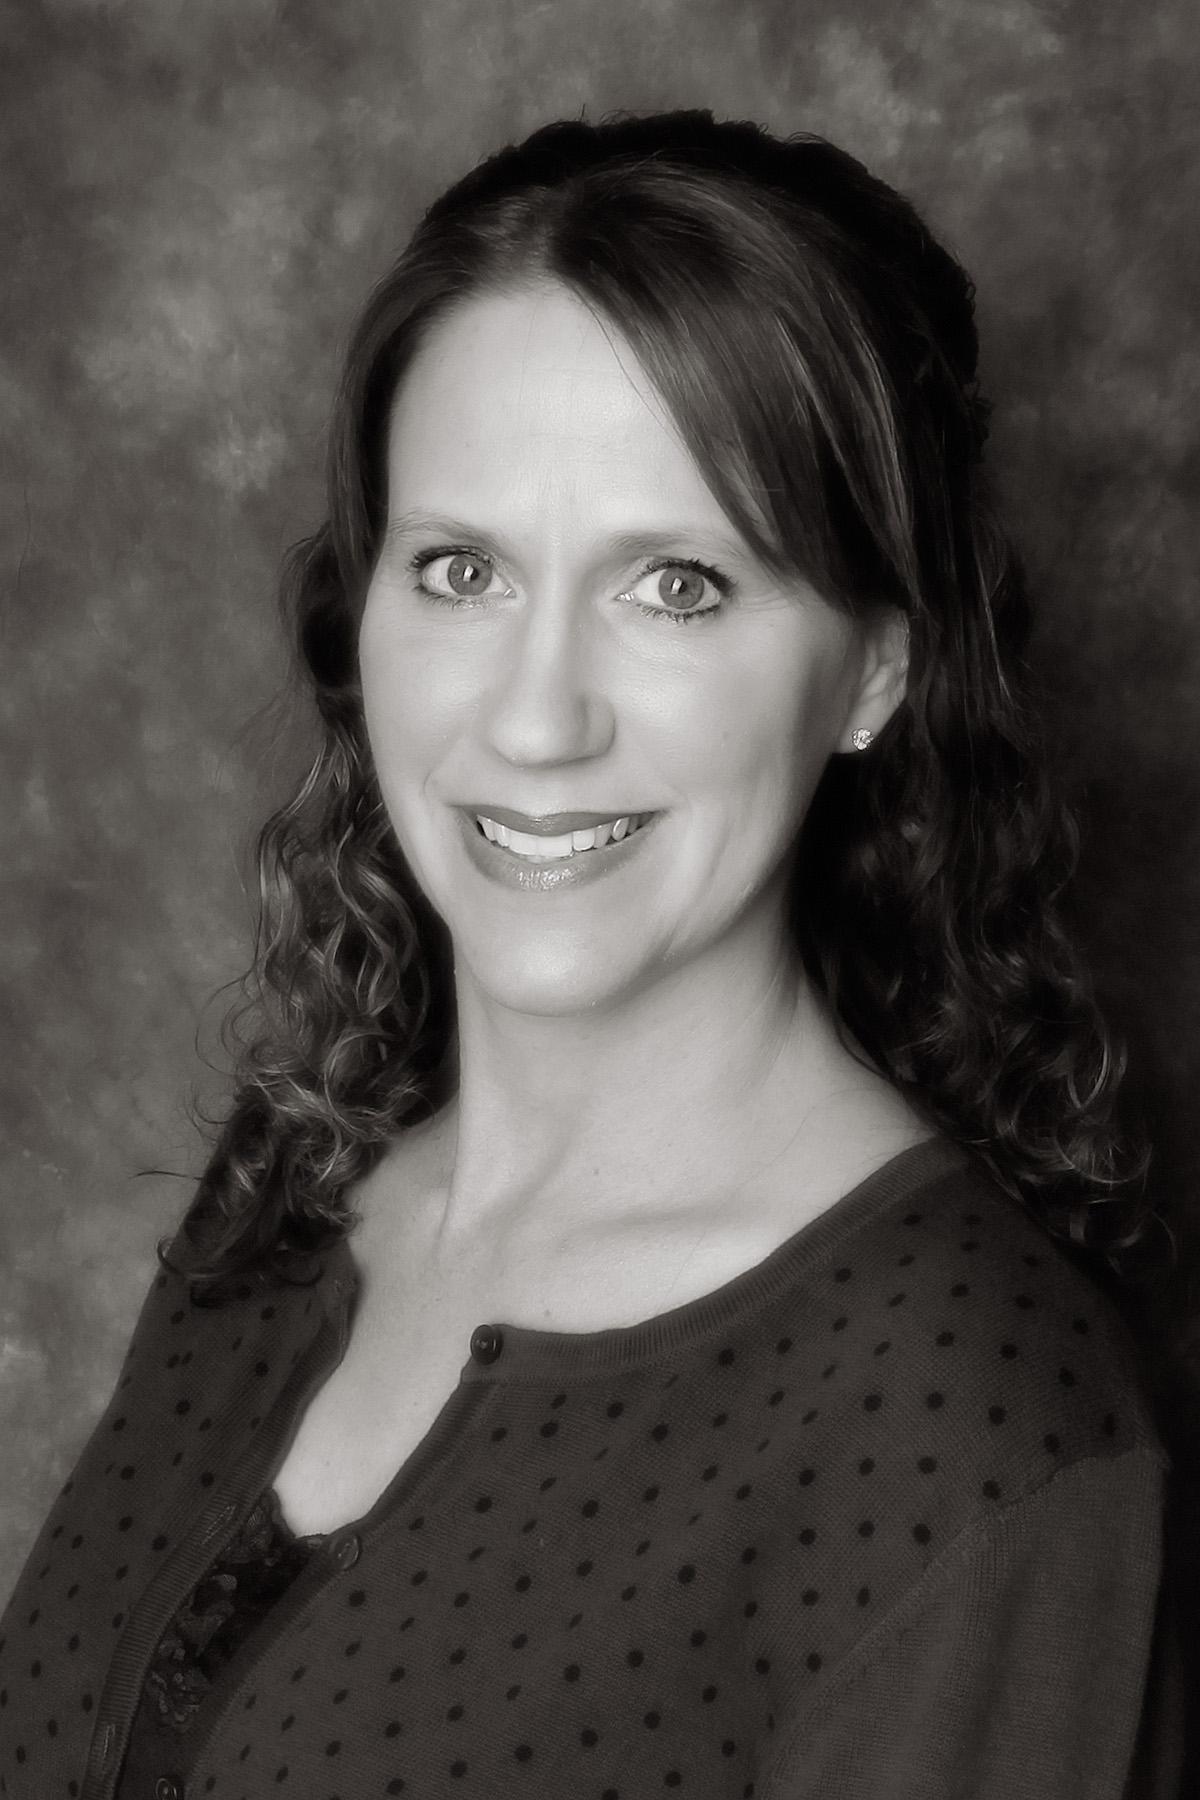 Allison Maier